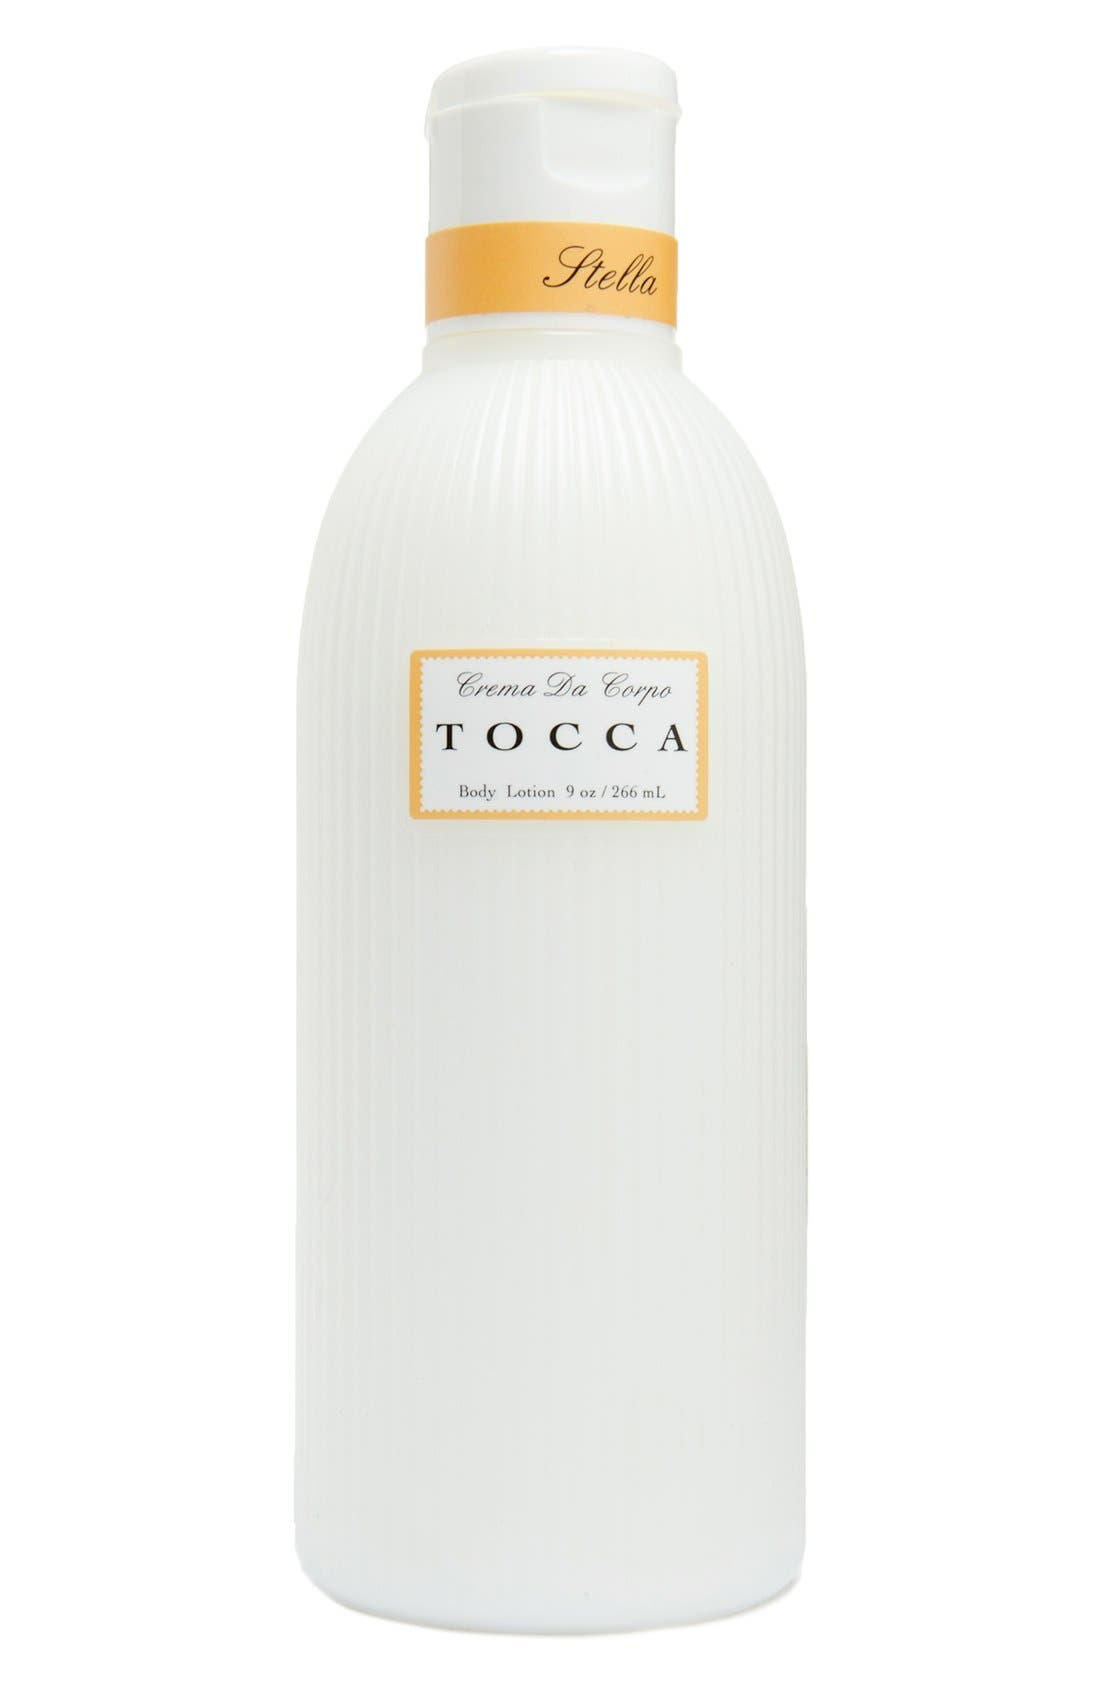 TOCCA 'Stella' Body Lotion